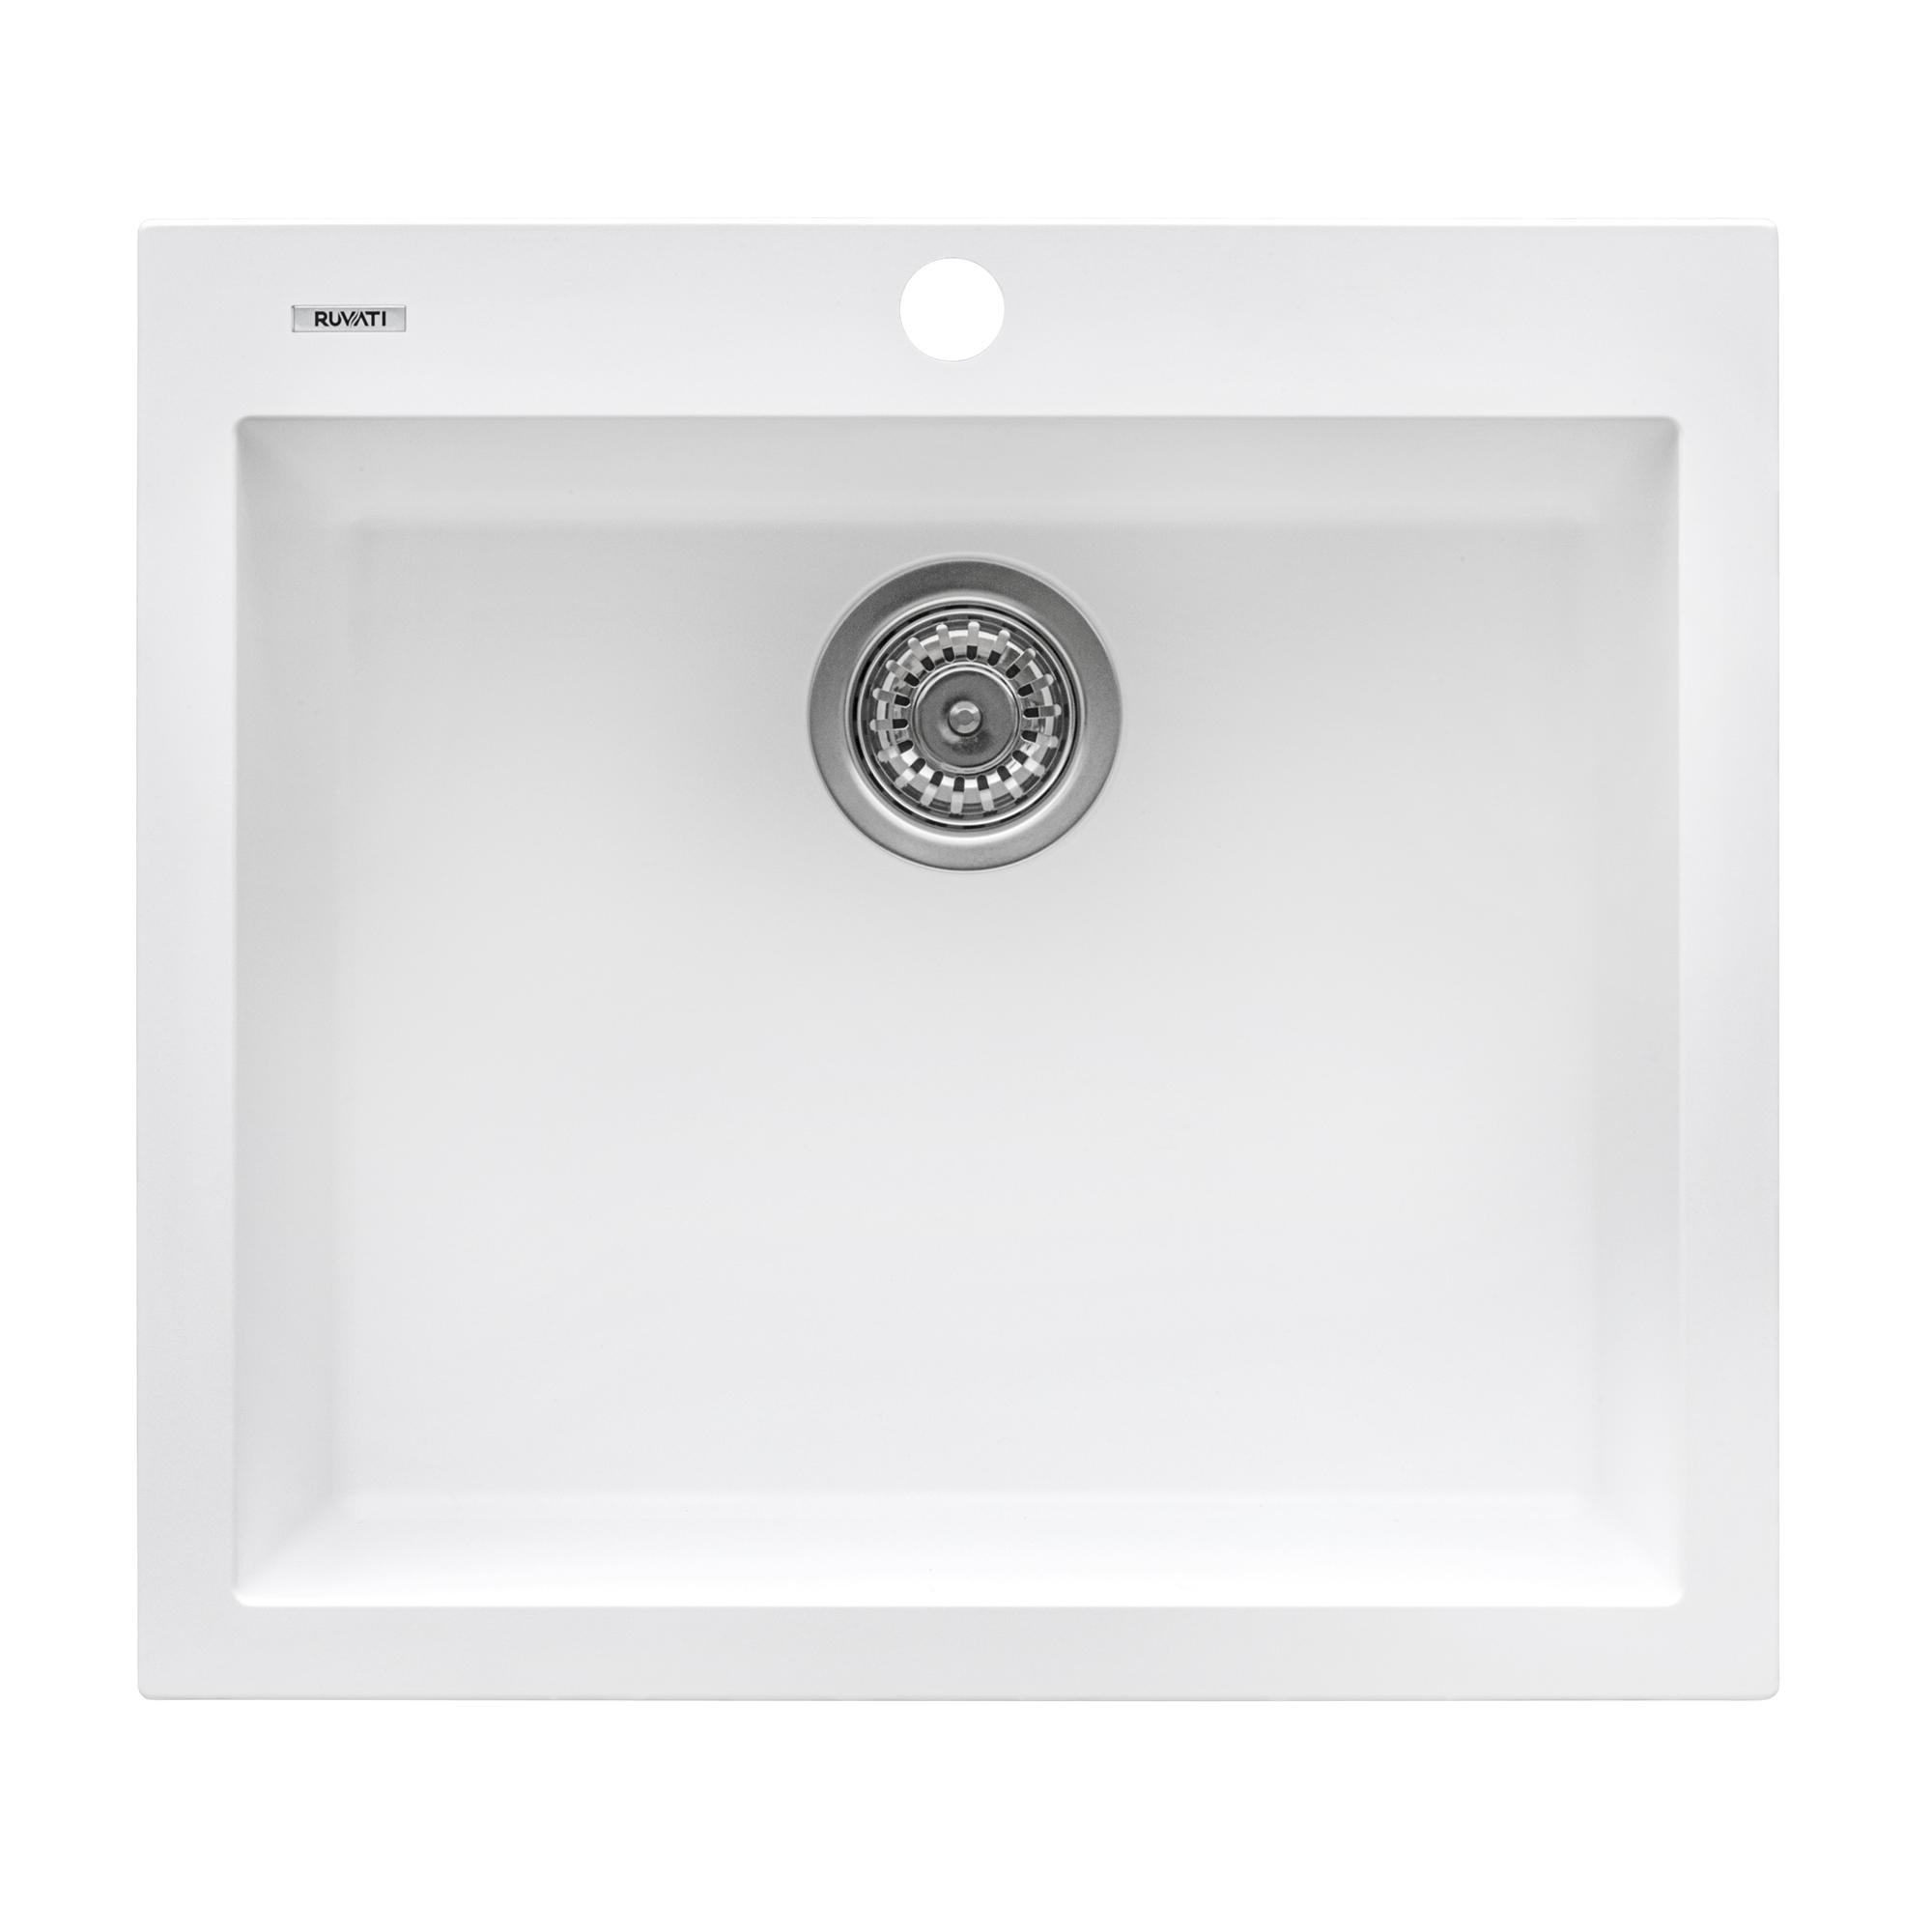 single bowl and kitchen faucet Granite composite kitchen sink SET